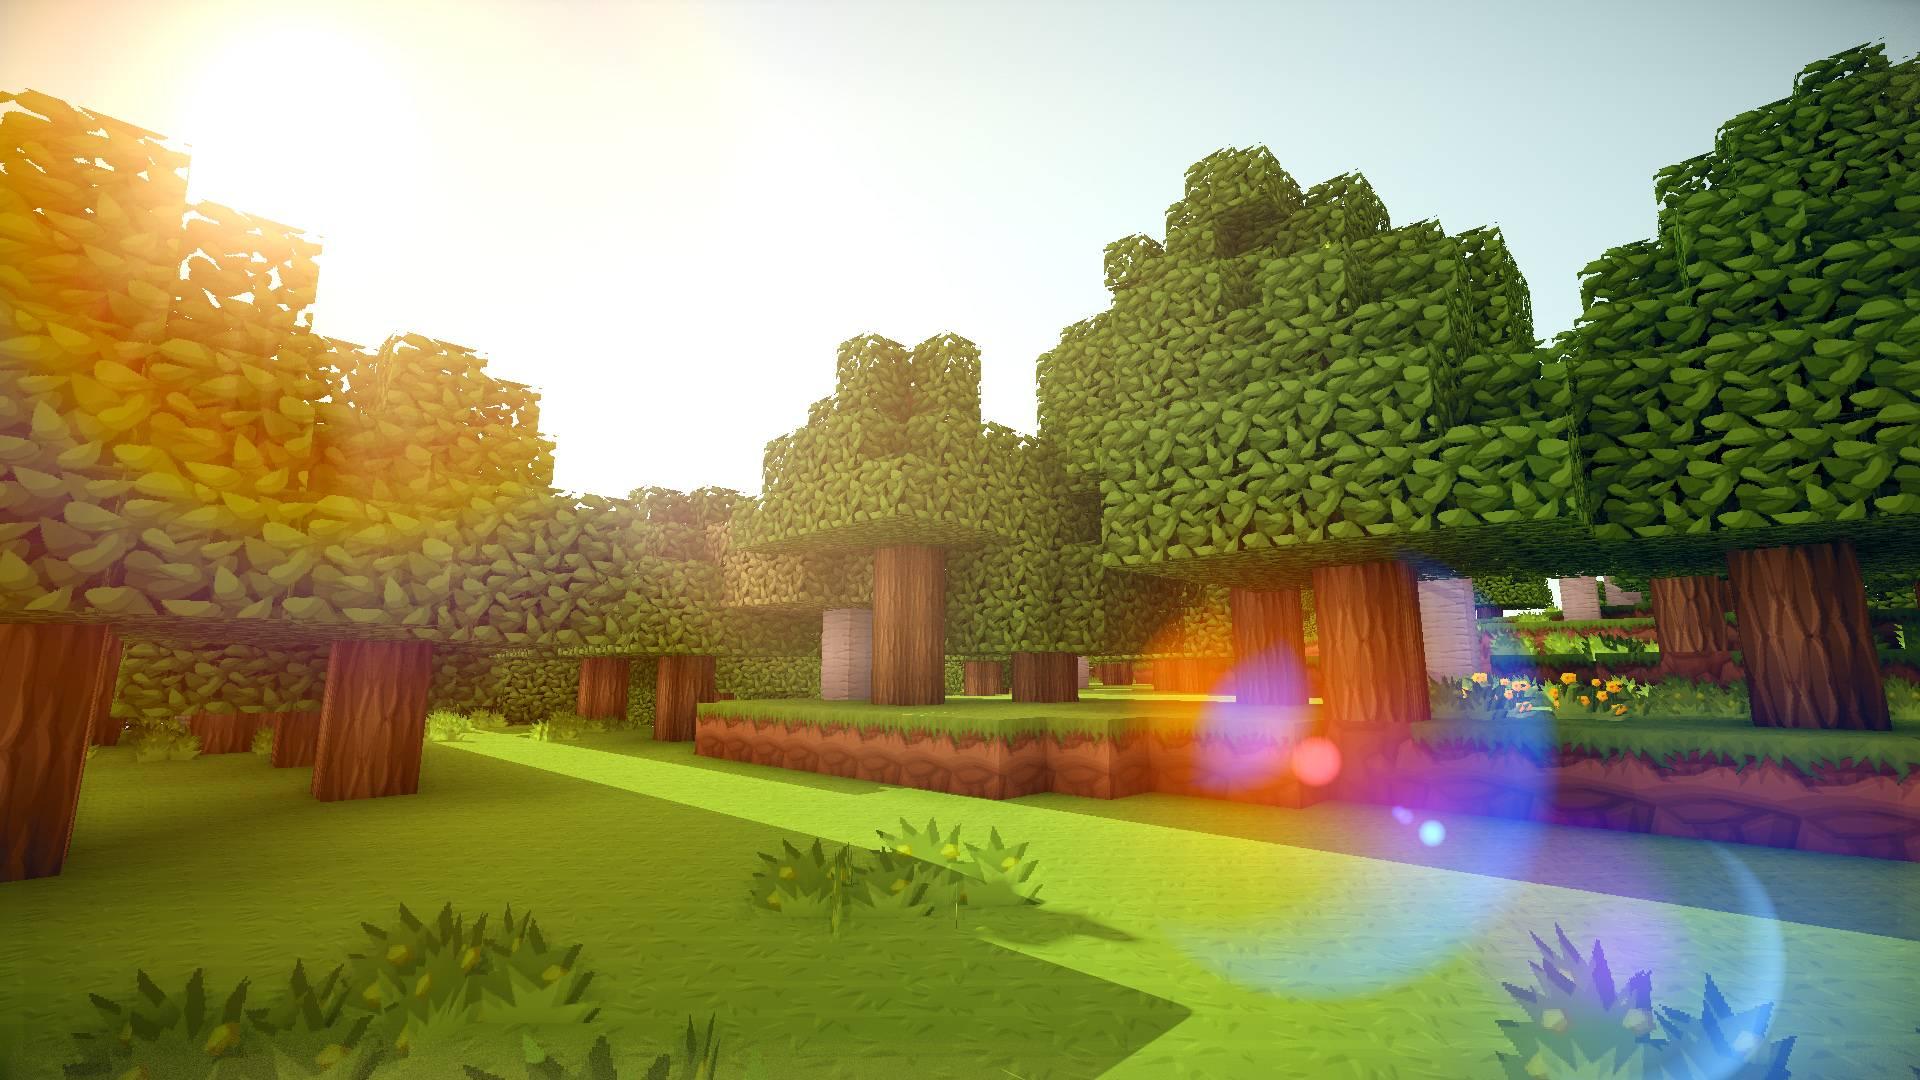 minecraft wallpaper,natural landscape,tree,biome,grass,sky